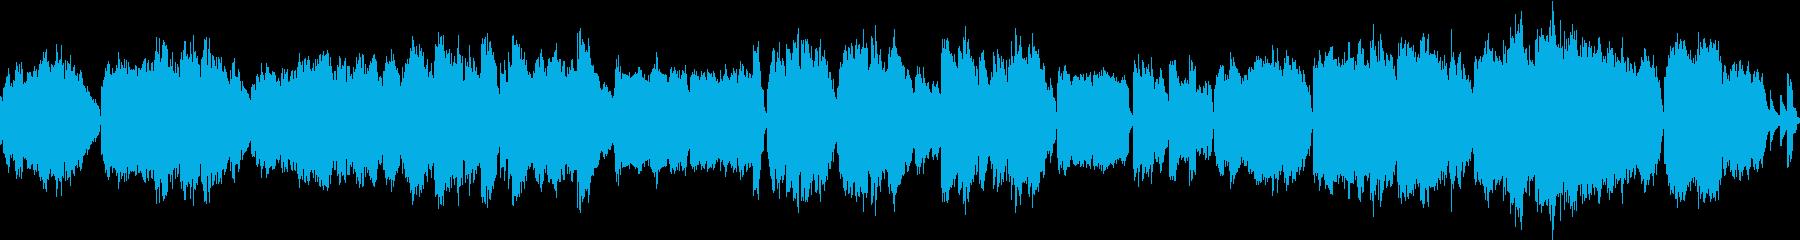 photoやvideoの上映中のBGM…の再生済みの波形